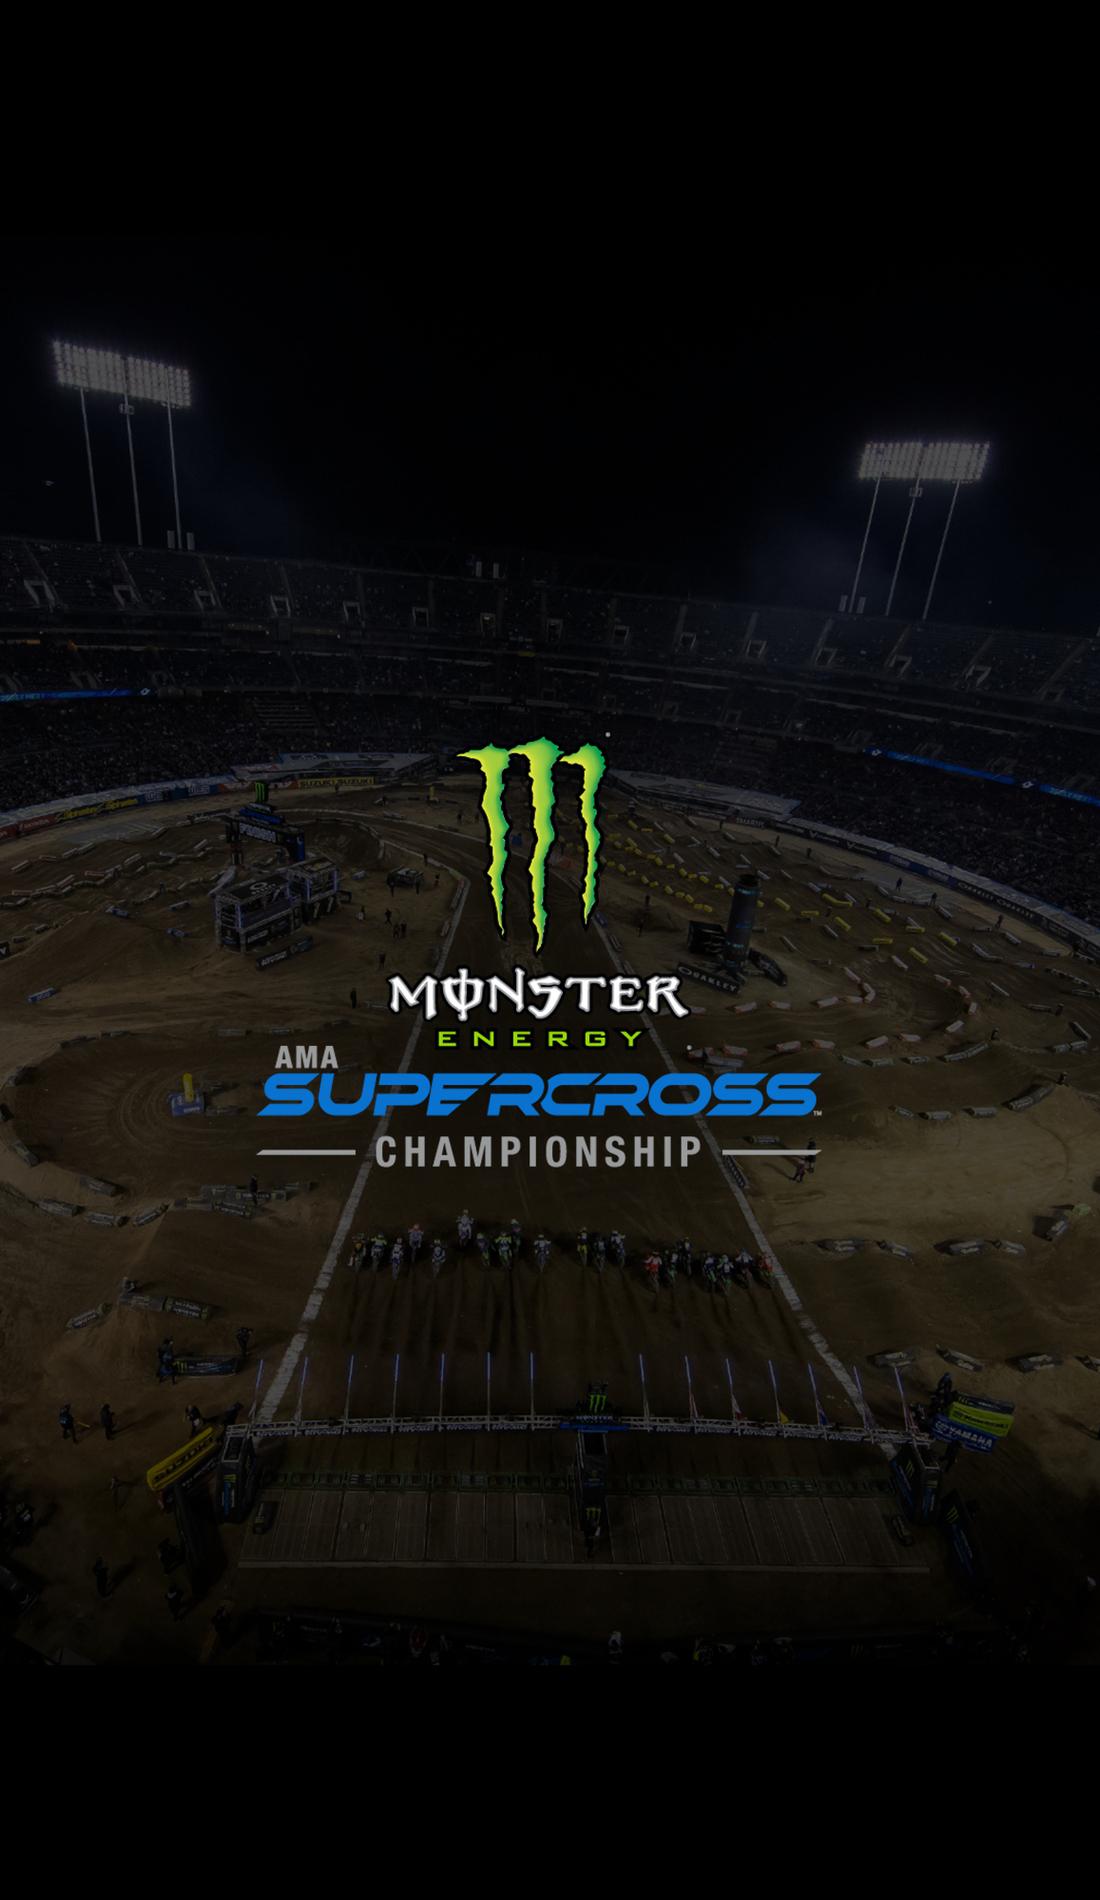 A Monster Energy AMA Supercross live event